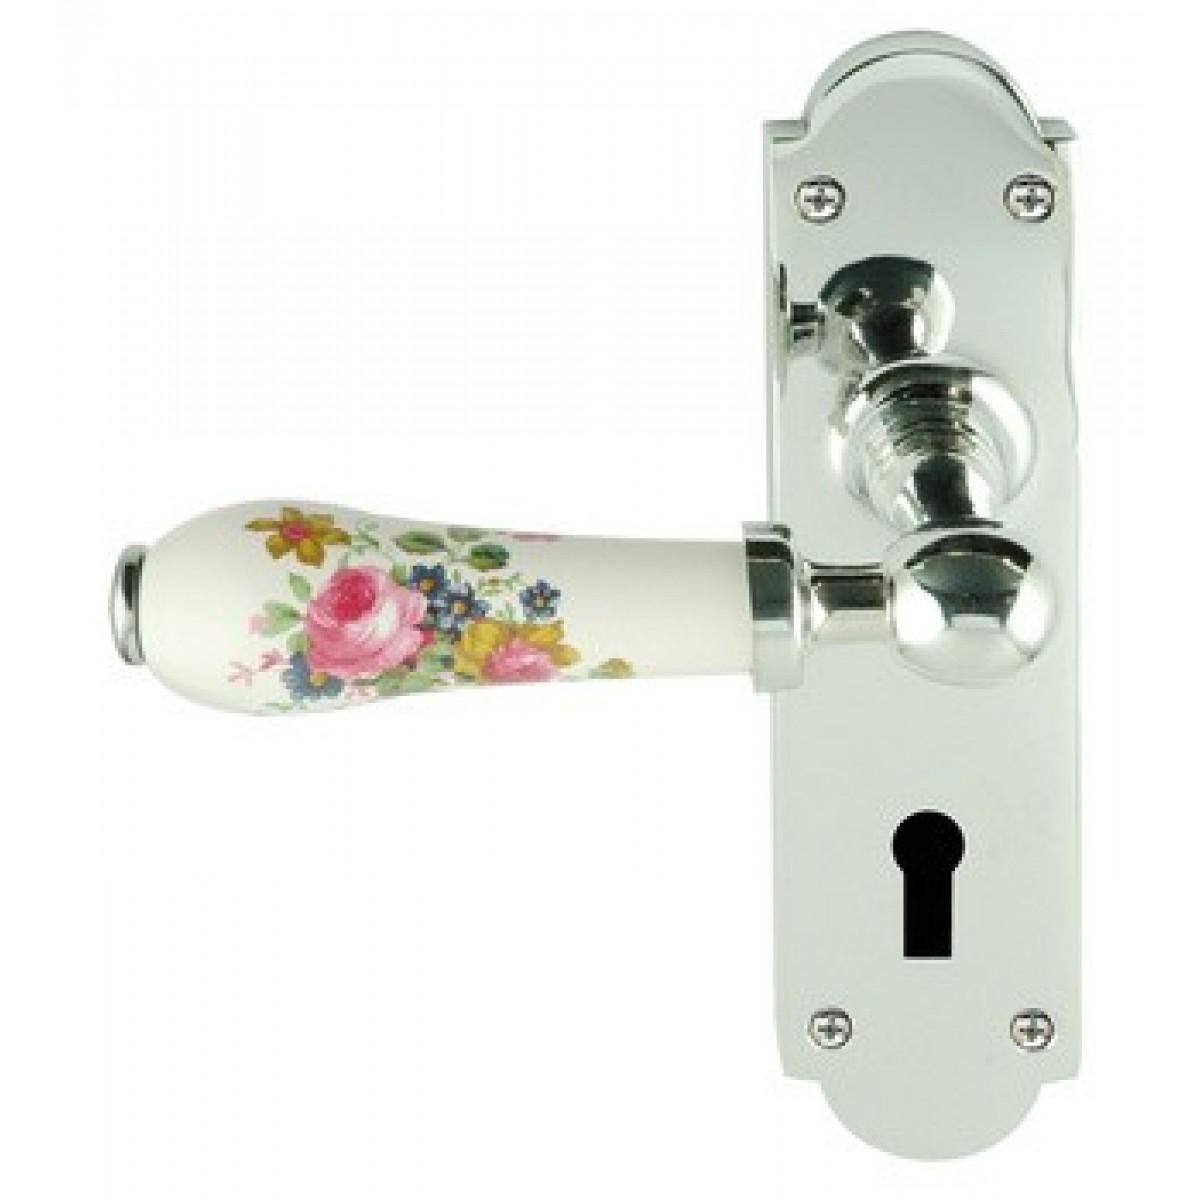 Chatsworth Bul29chip Chippendale Porcelain Door Handle